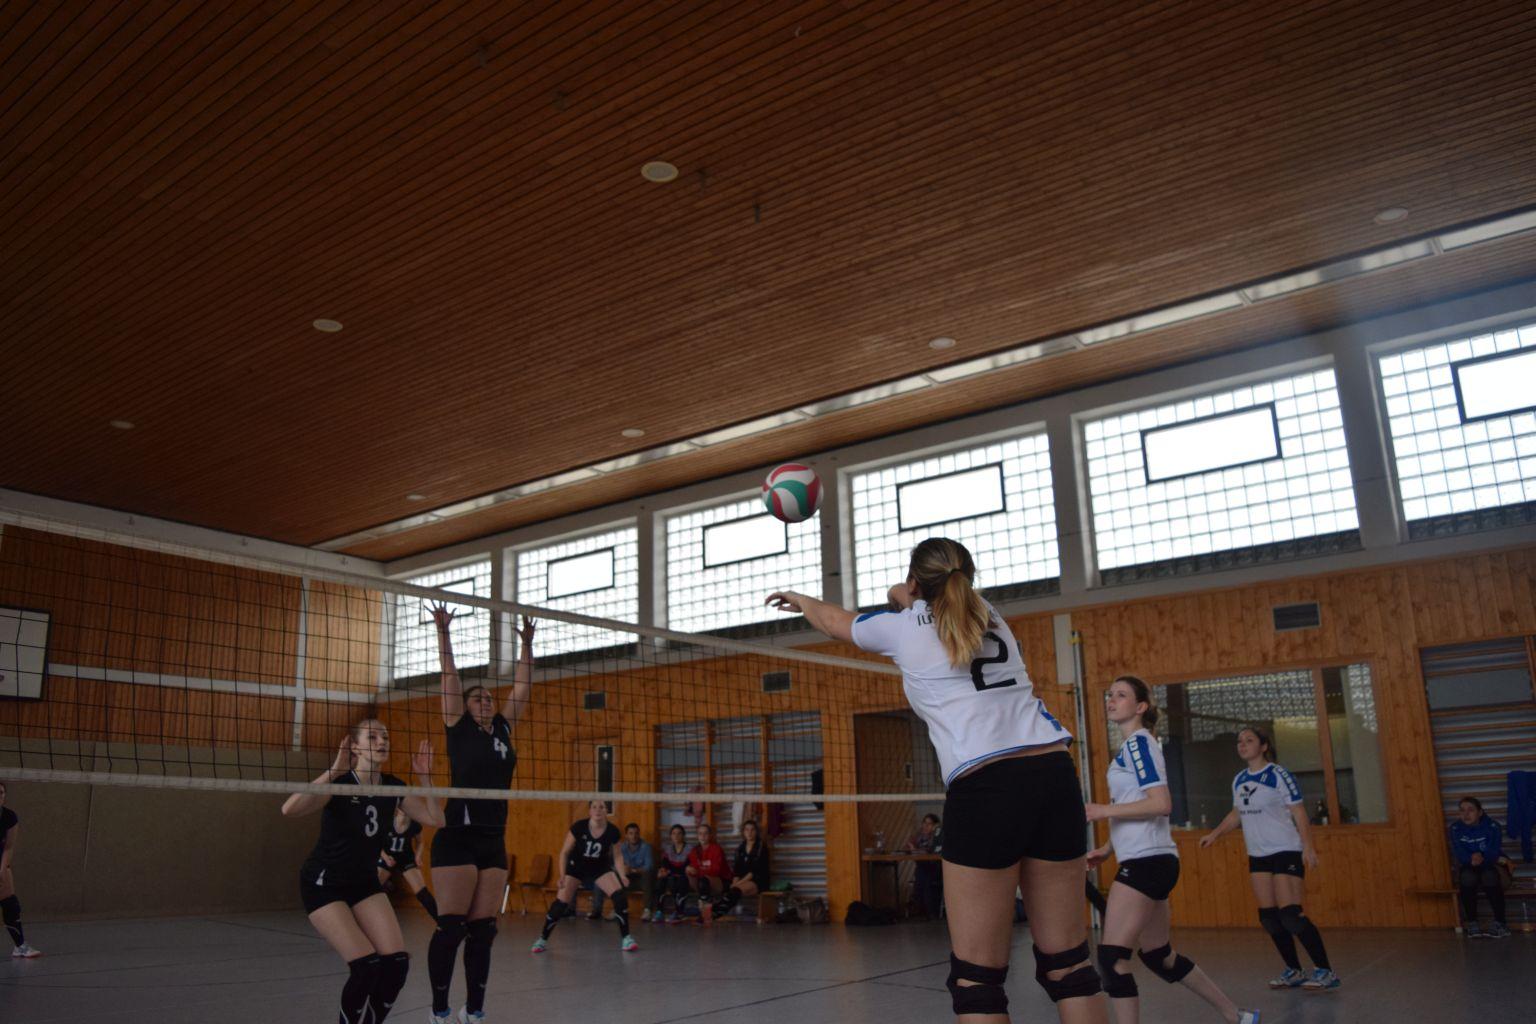 170311_Volleyball_DSC_0178